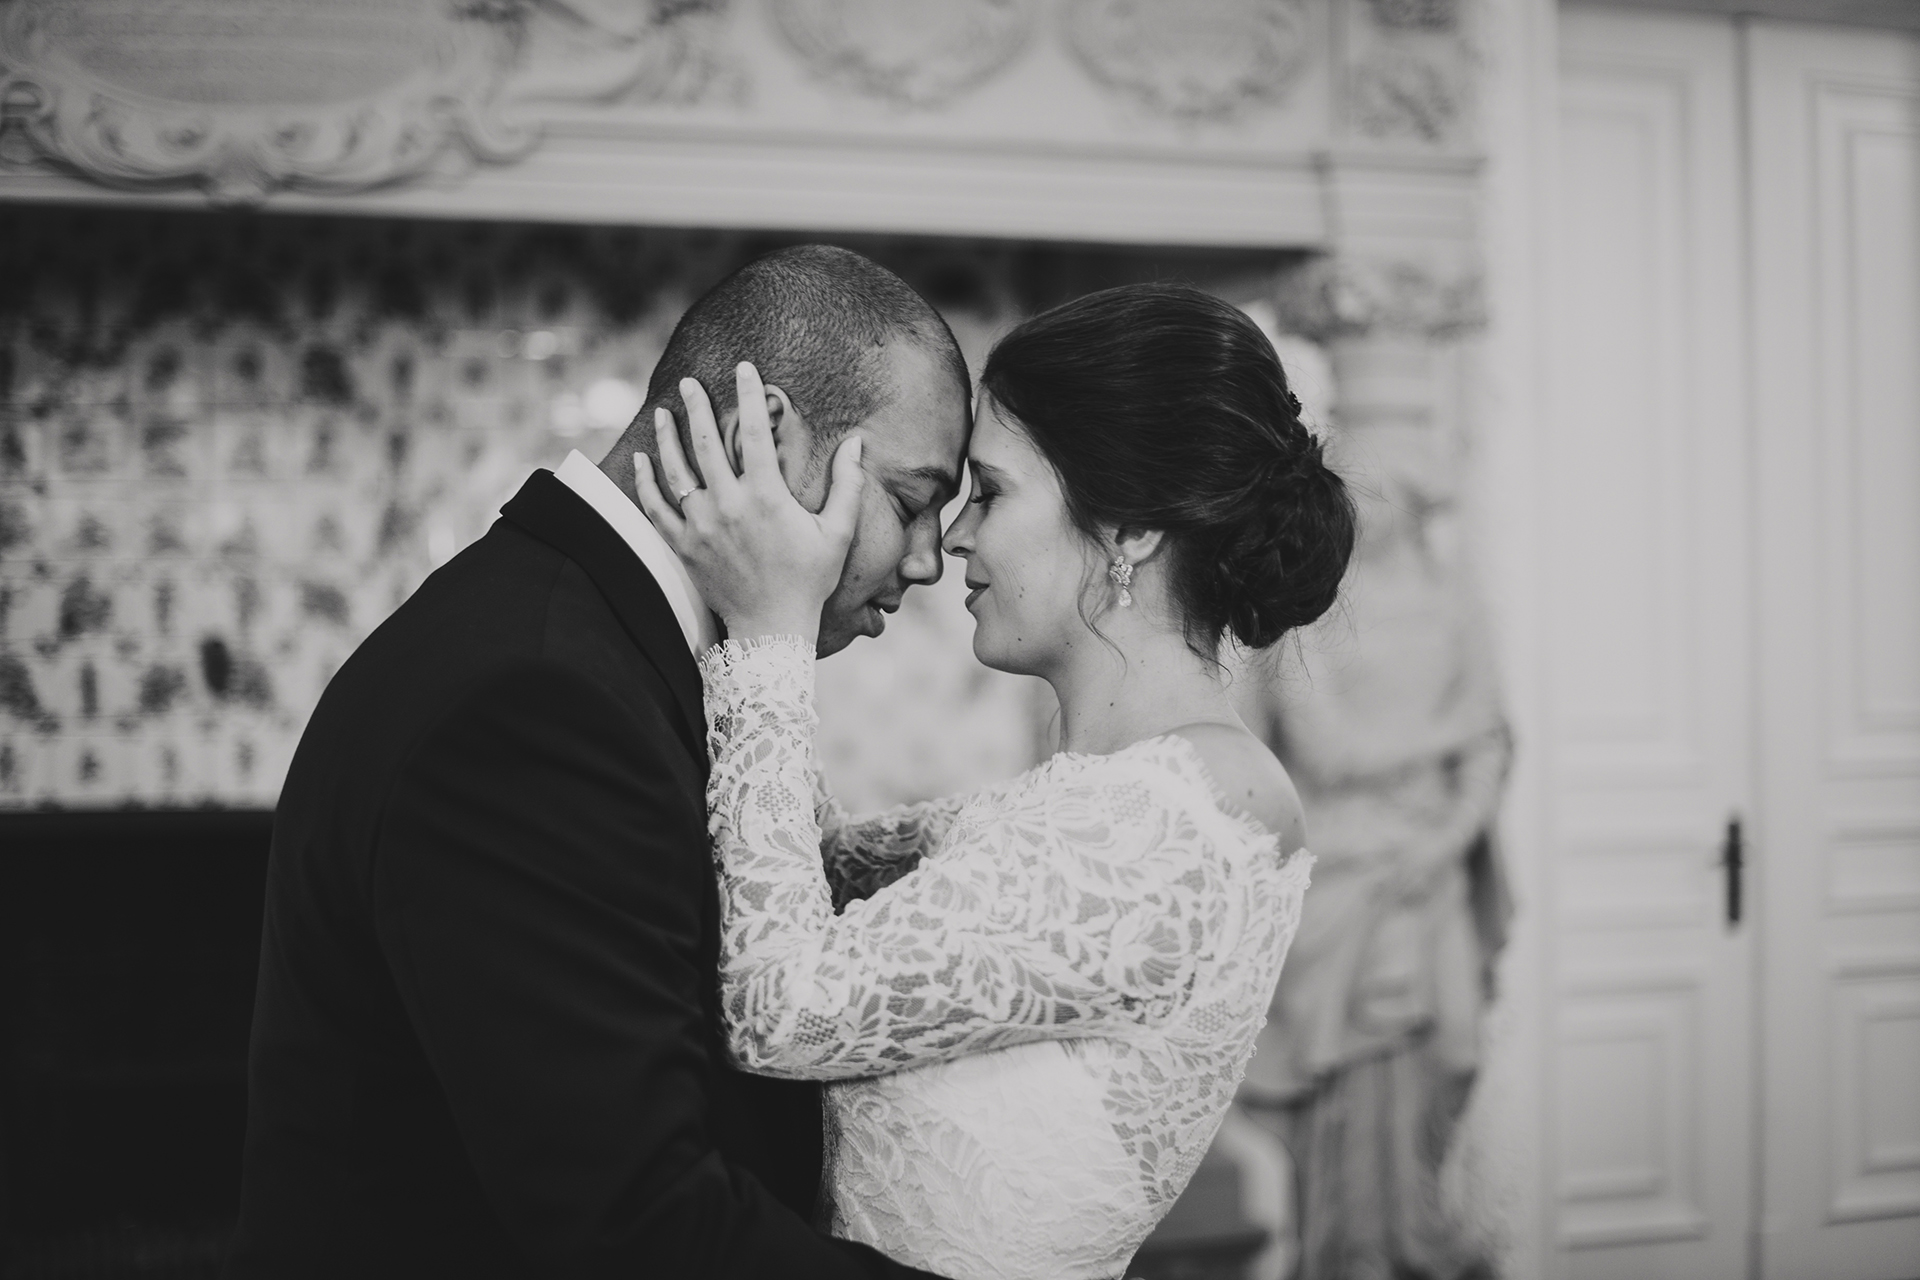 Hochzeitsreportage_J&D_057_Caroline Queda Fotografie